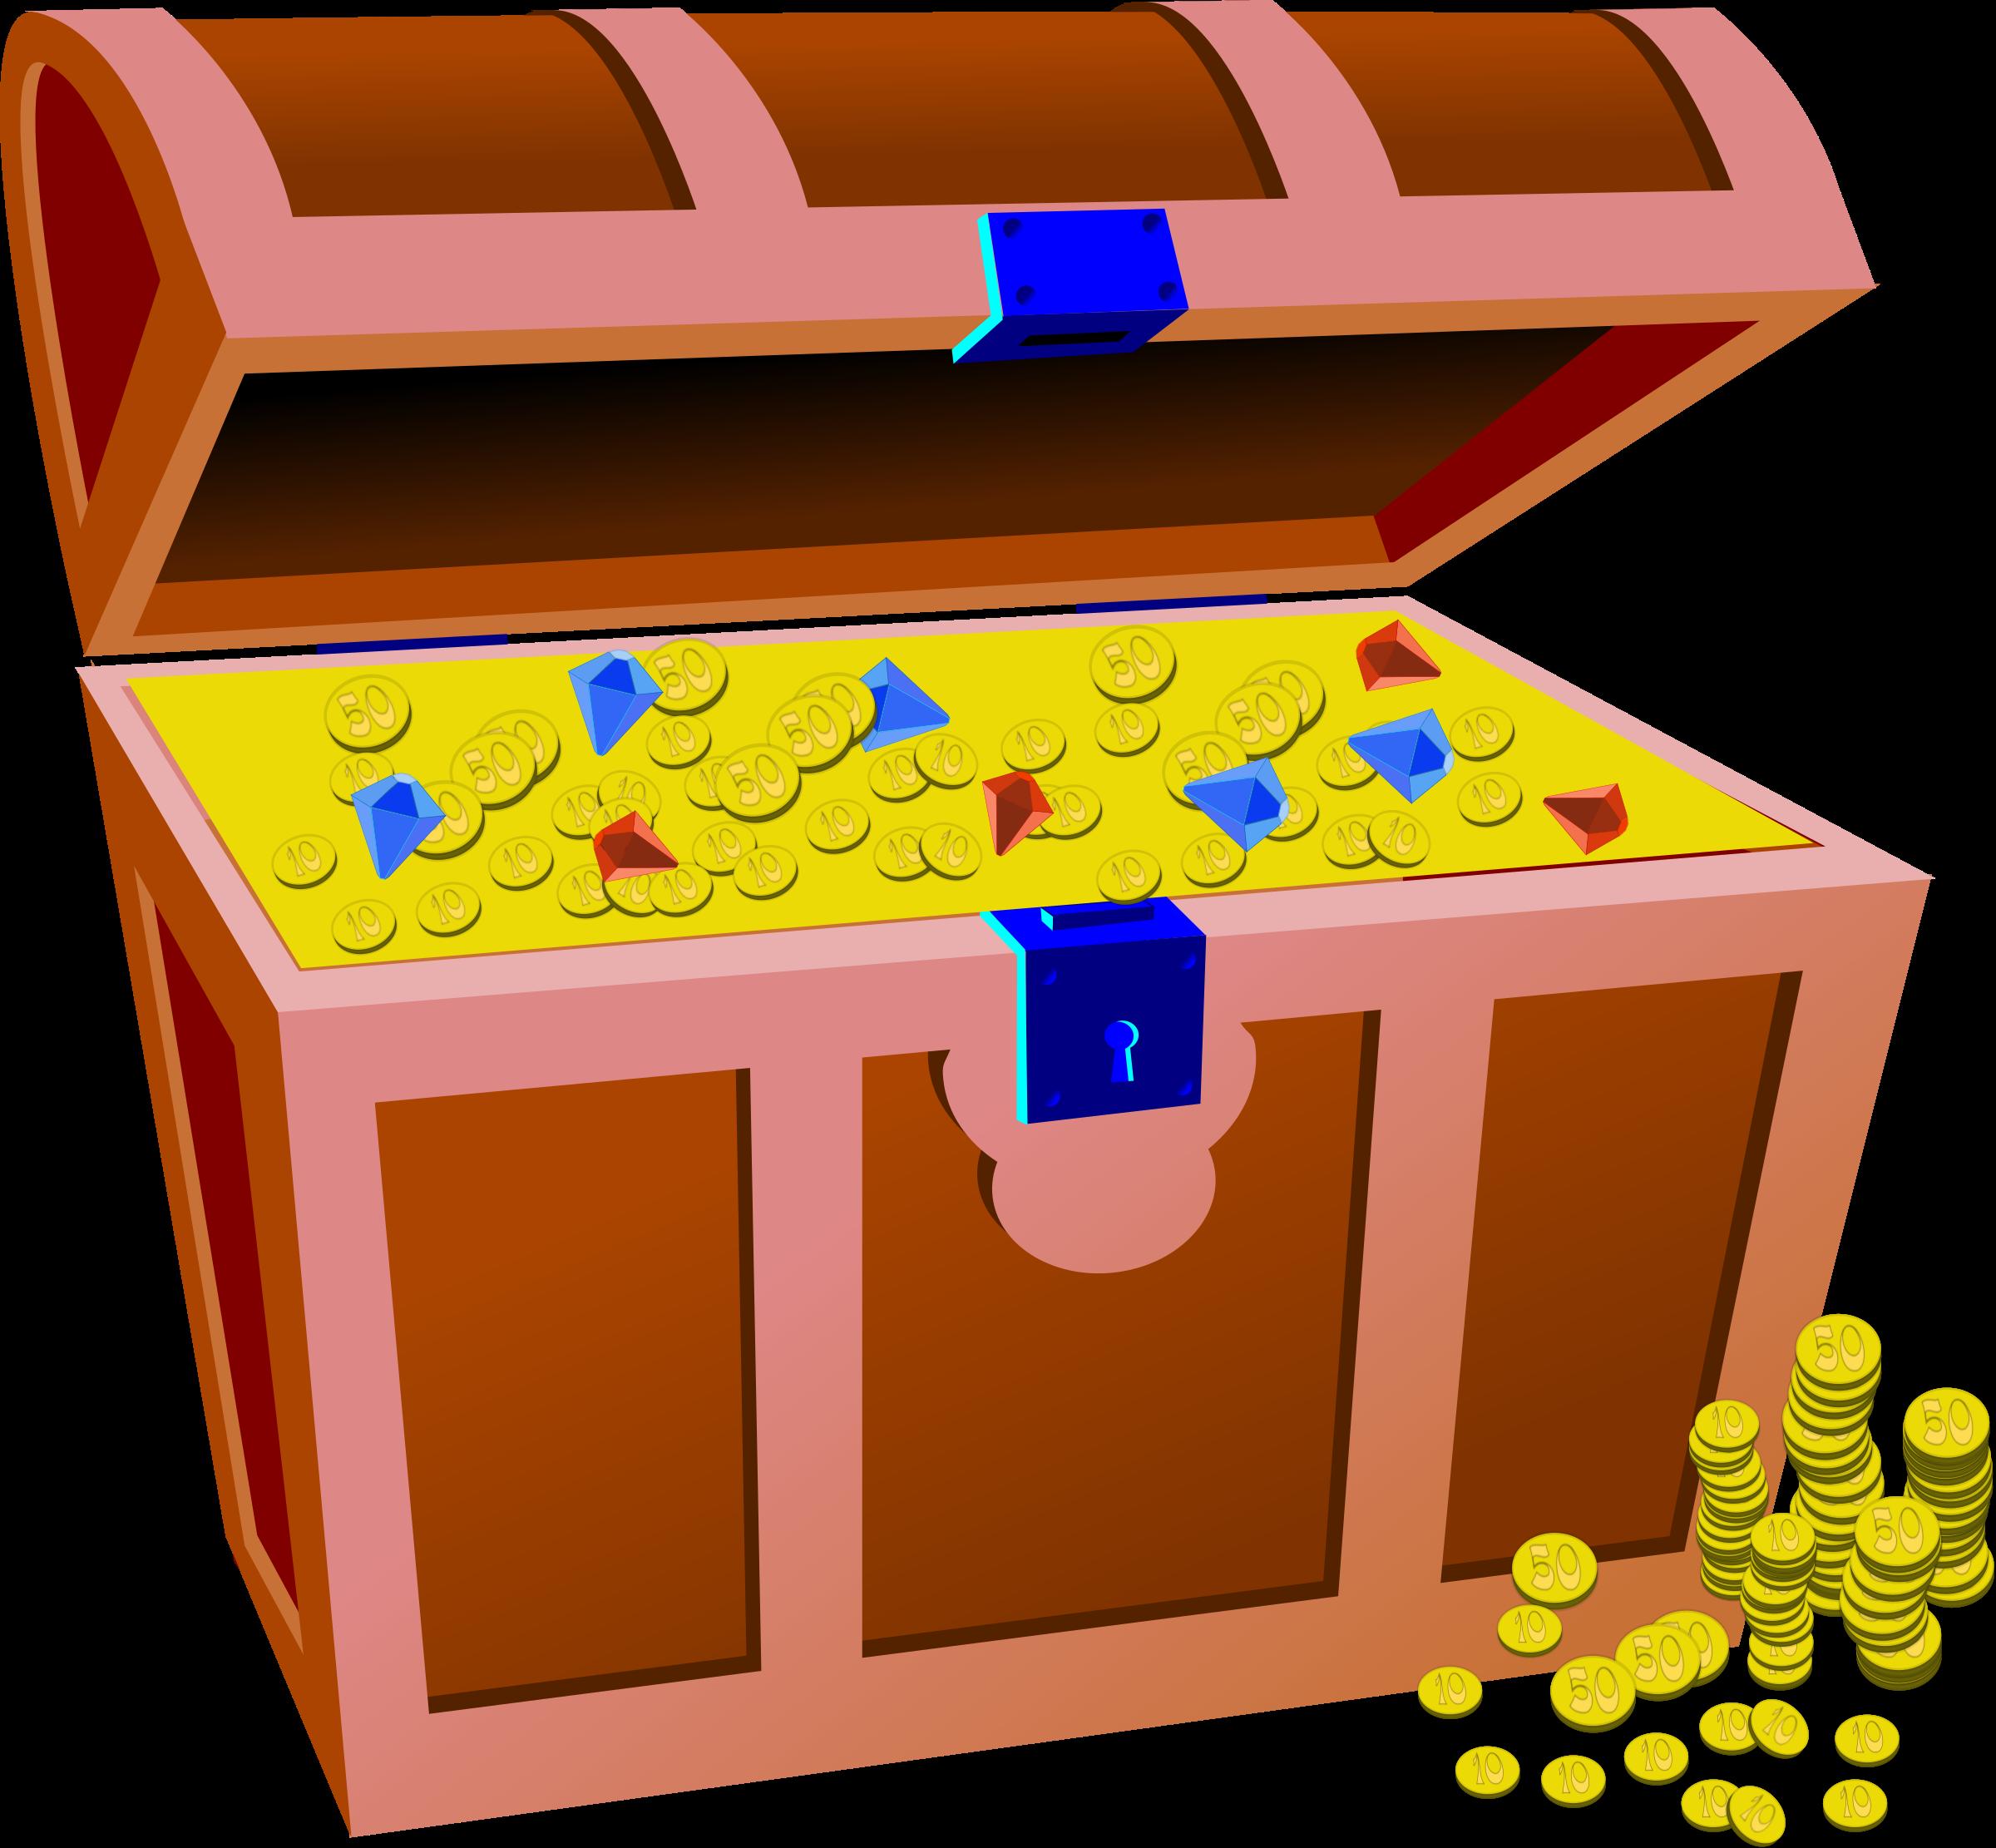 Treasure clipart big. Full chest image png